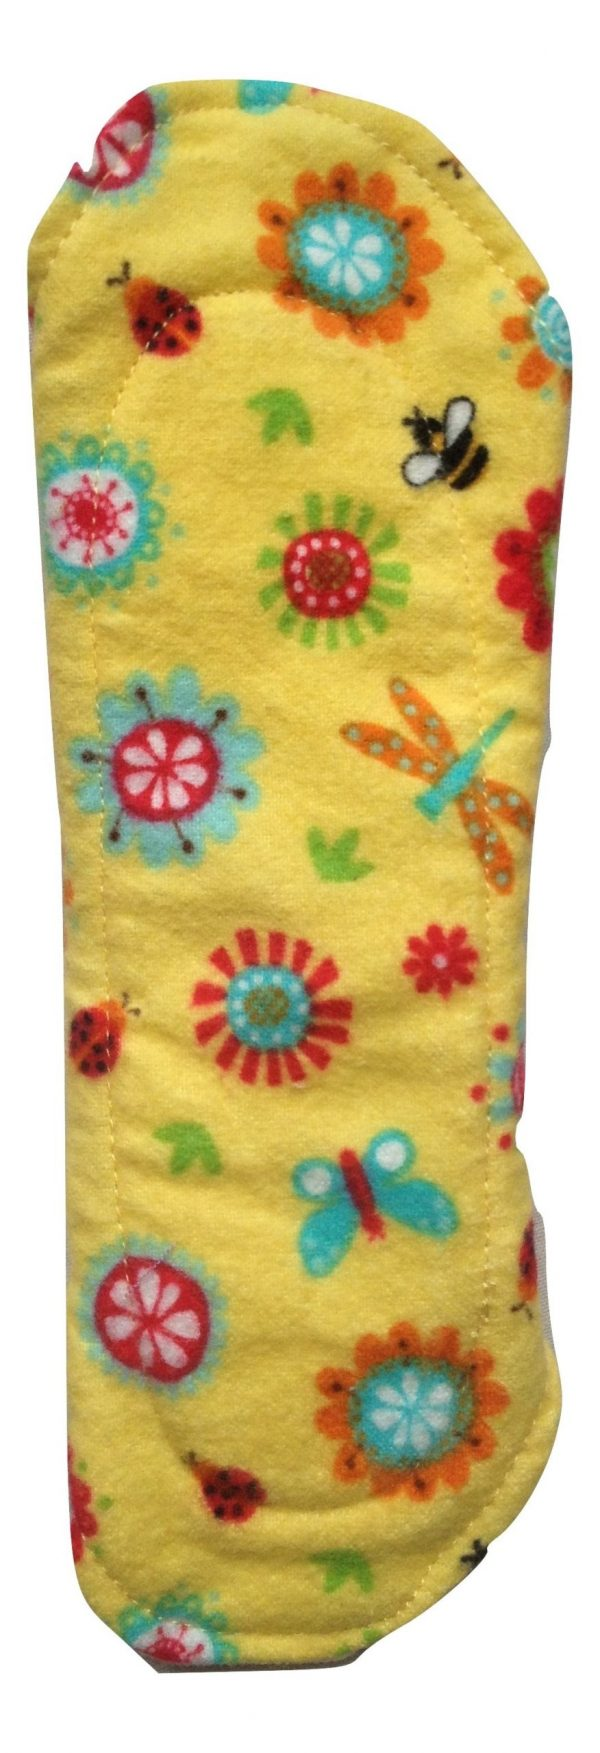 Angelpadz Spring Flowers Cotton Flannel Pantyliner